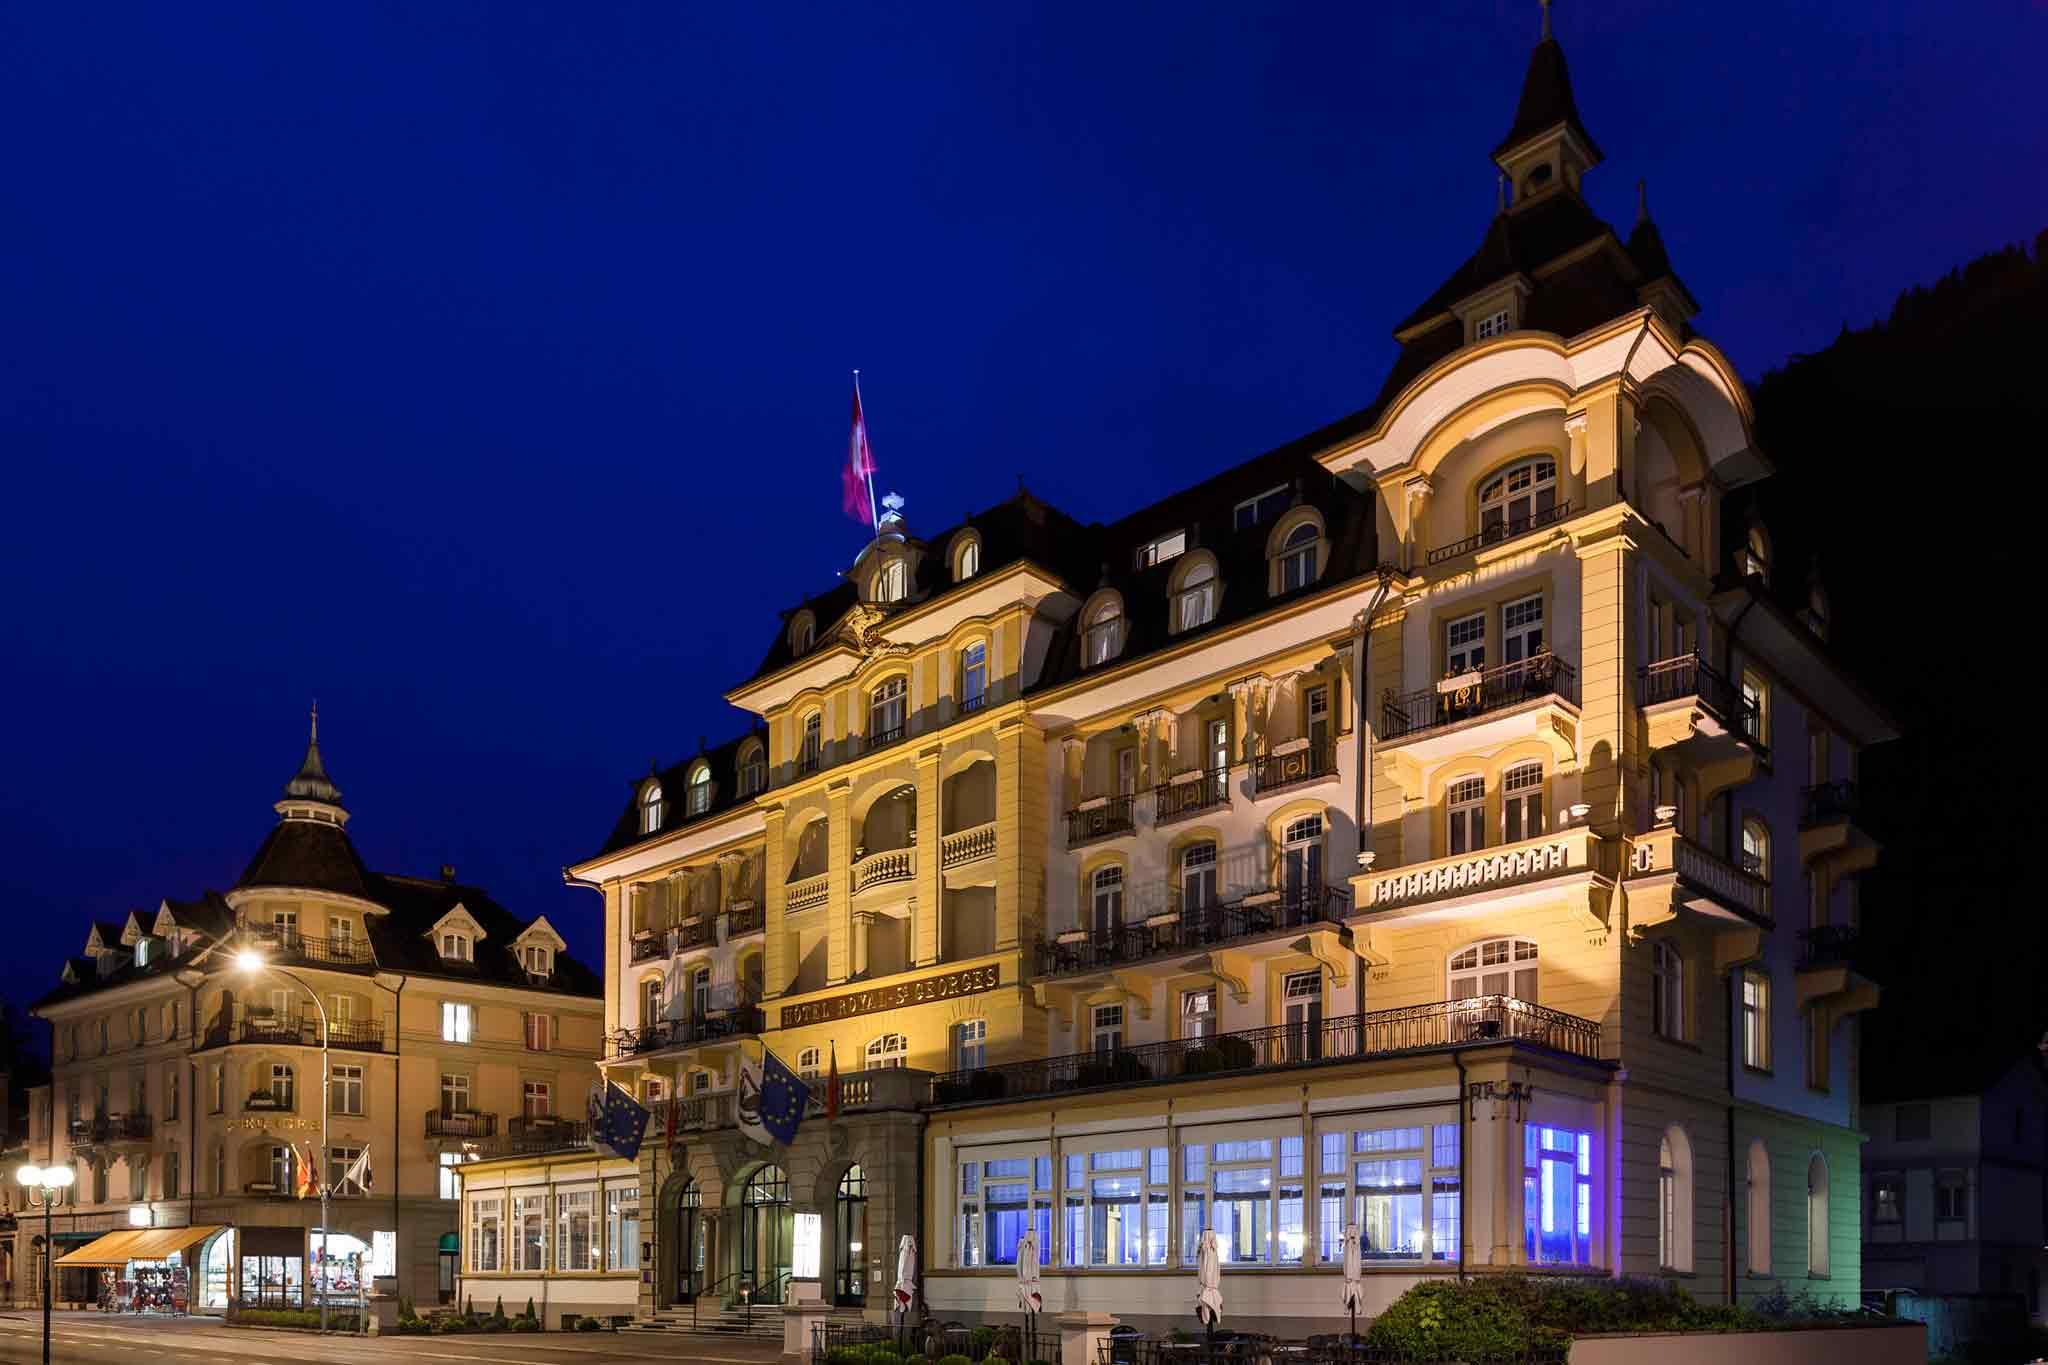 Hotel - Hotel Royal St Georges Interlaken - MGallery by Sofitel